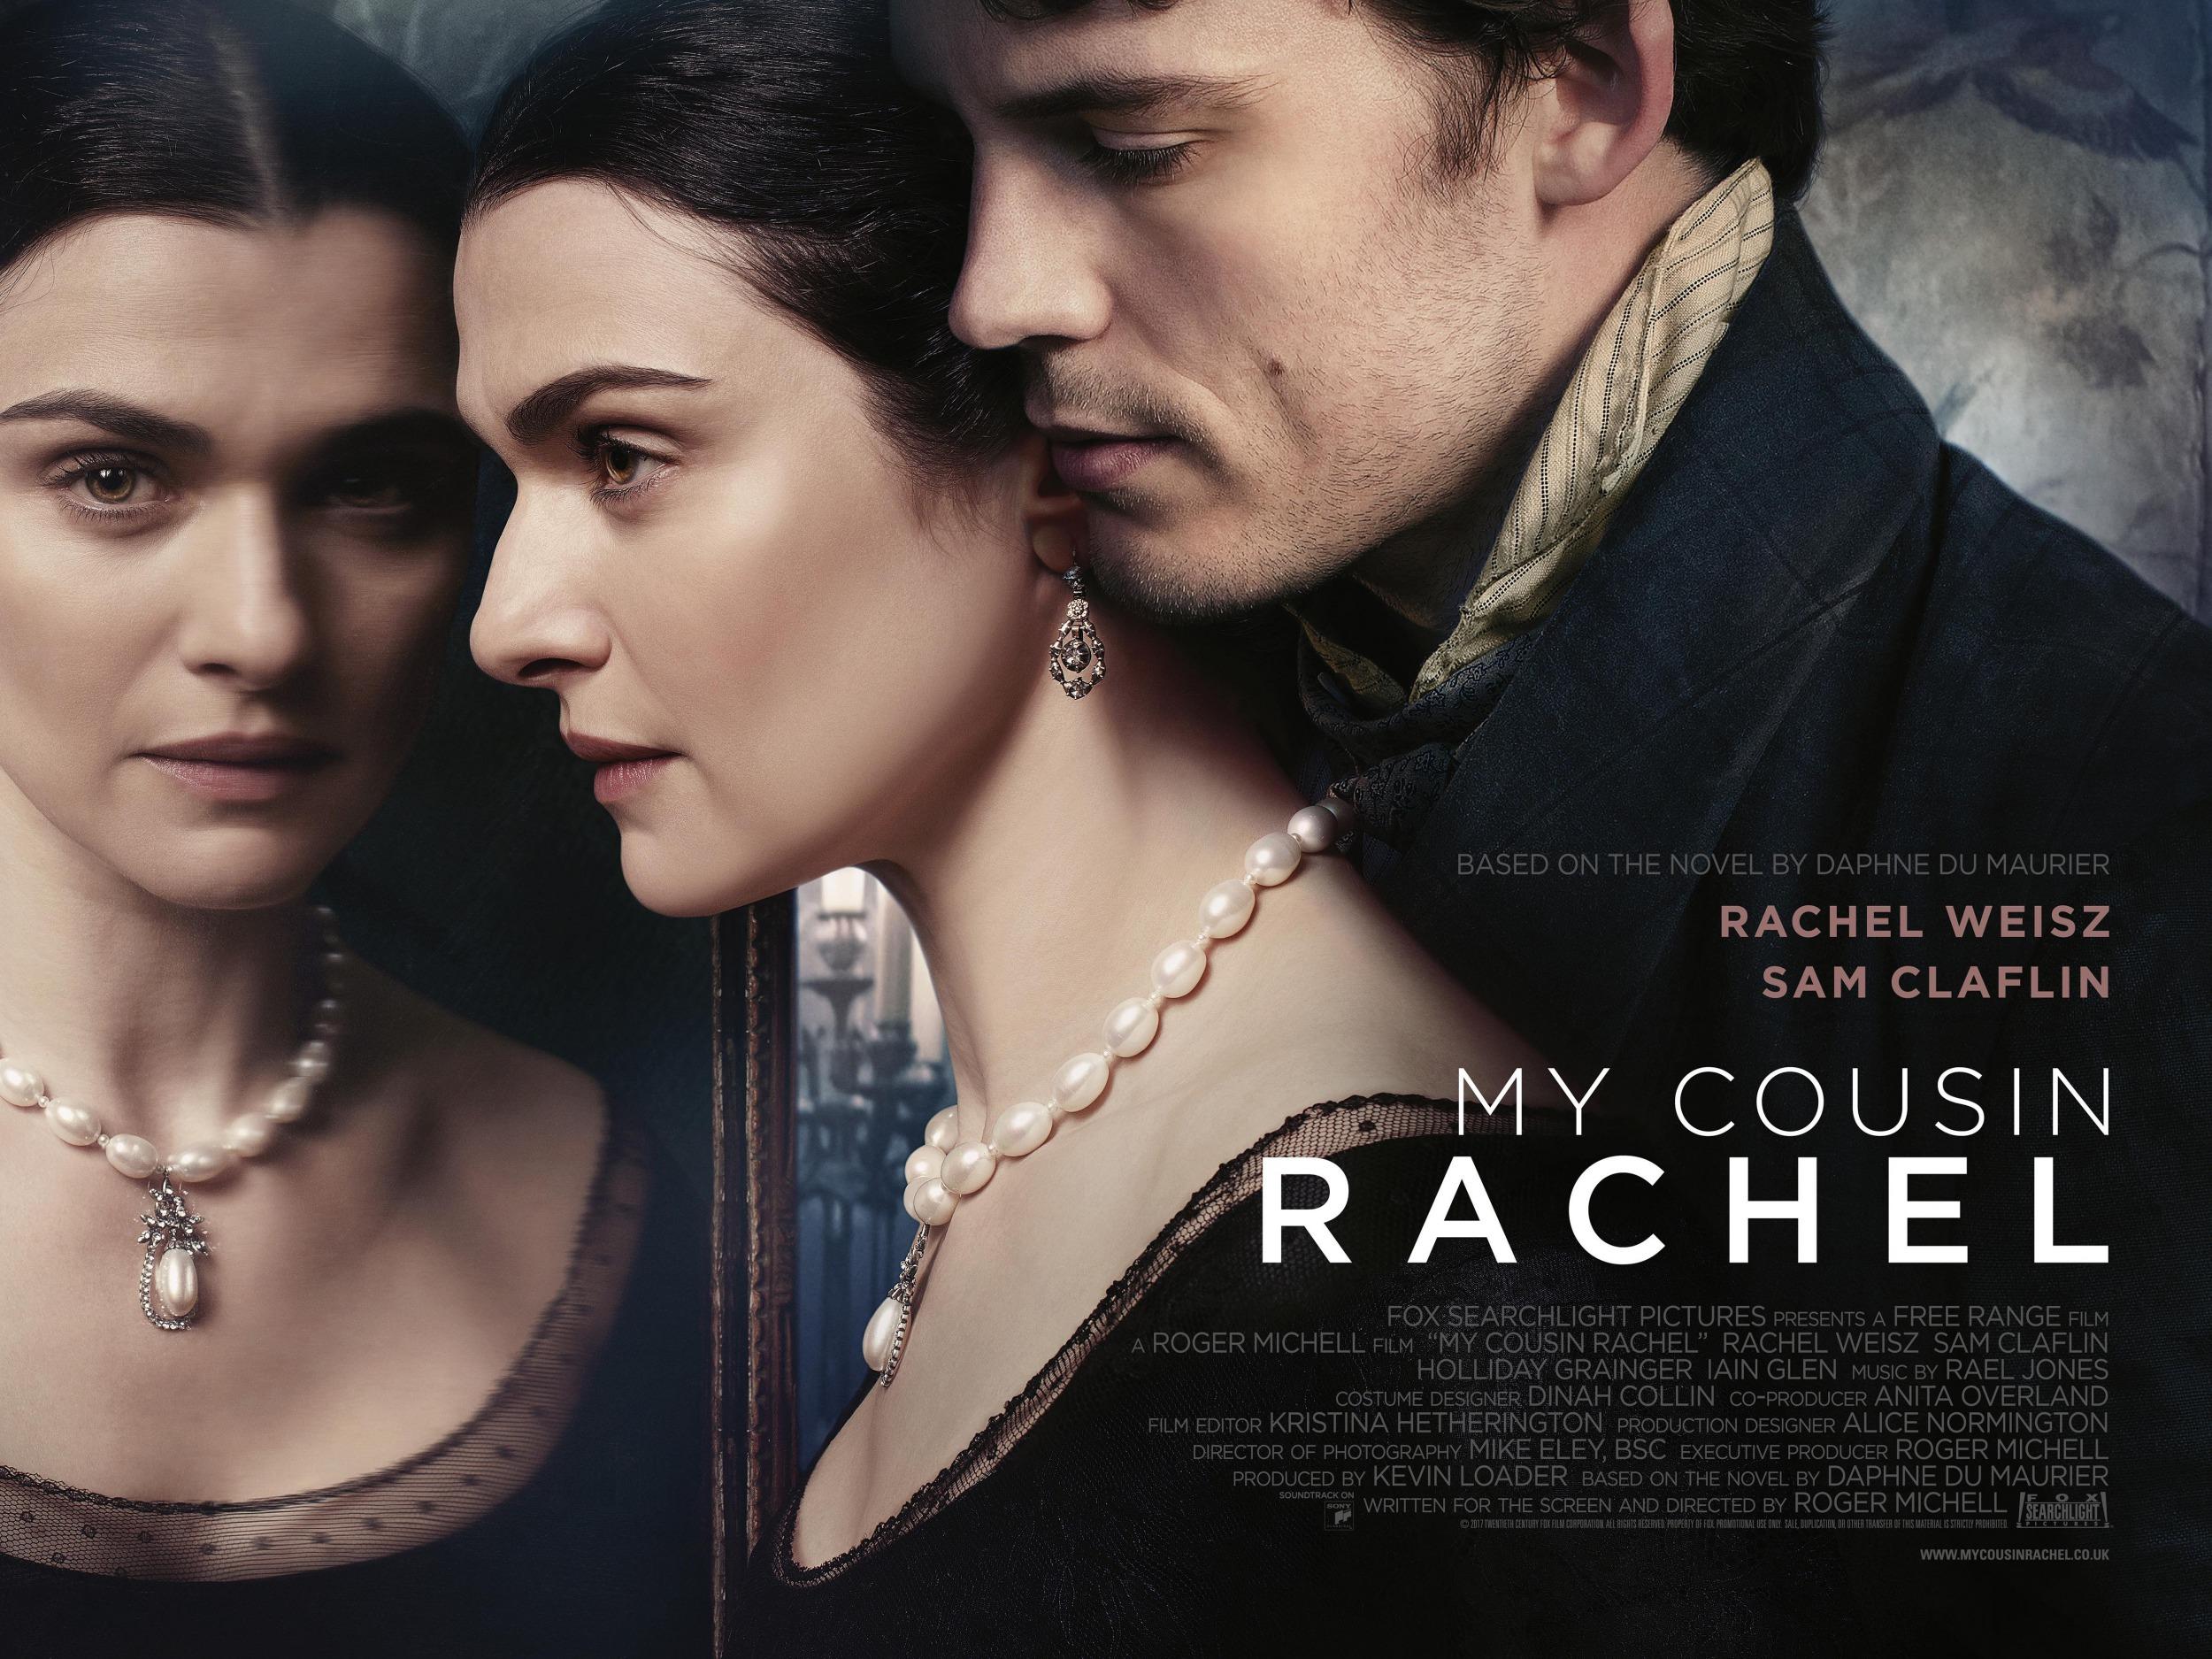 My Cousin Rachel Official Poster